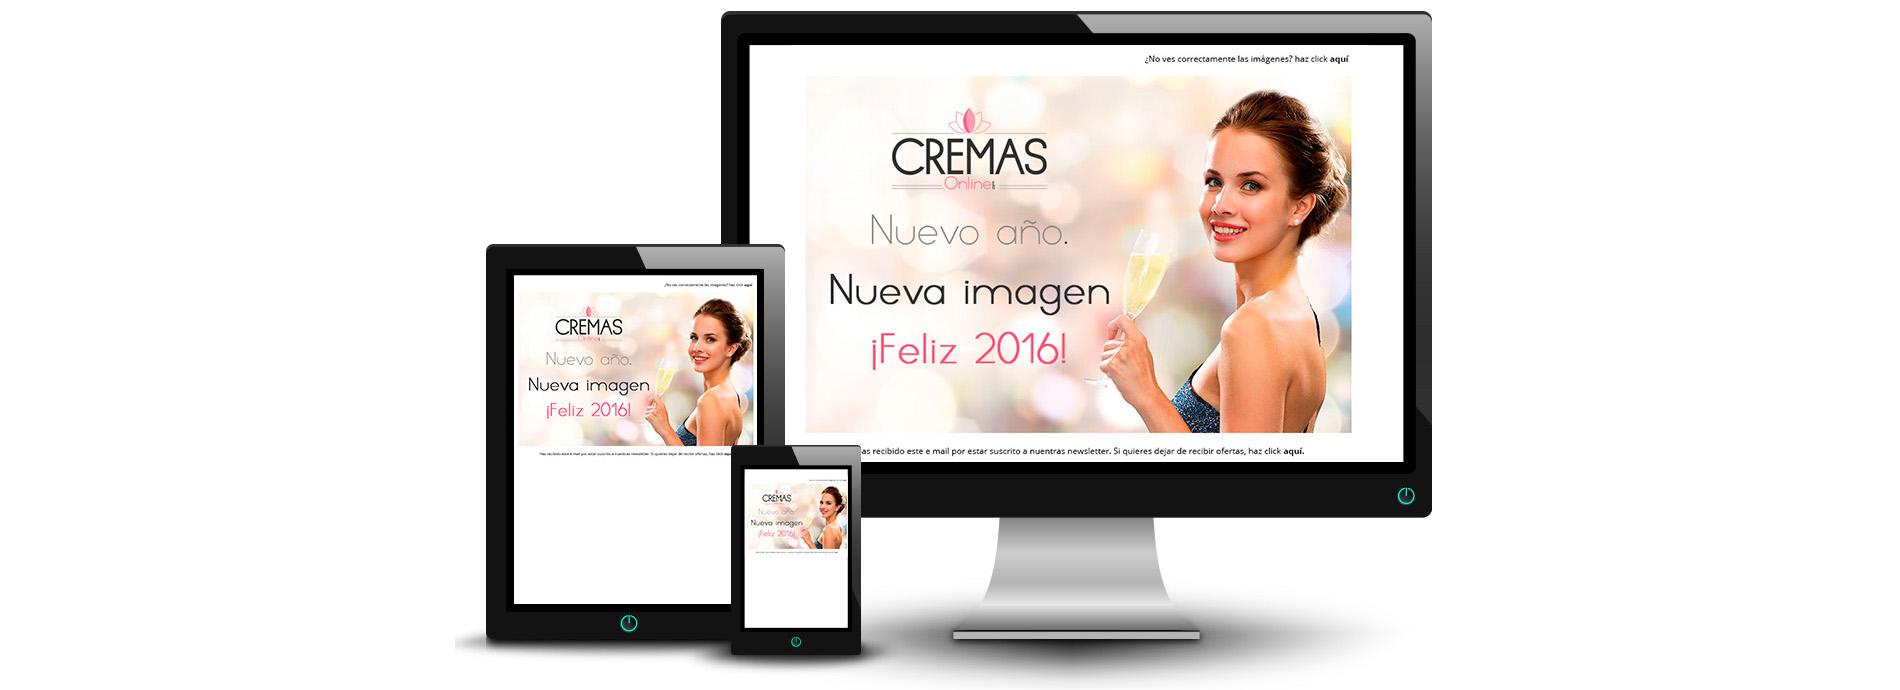 cremas3